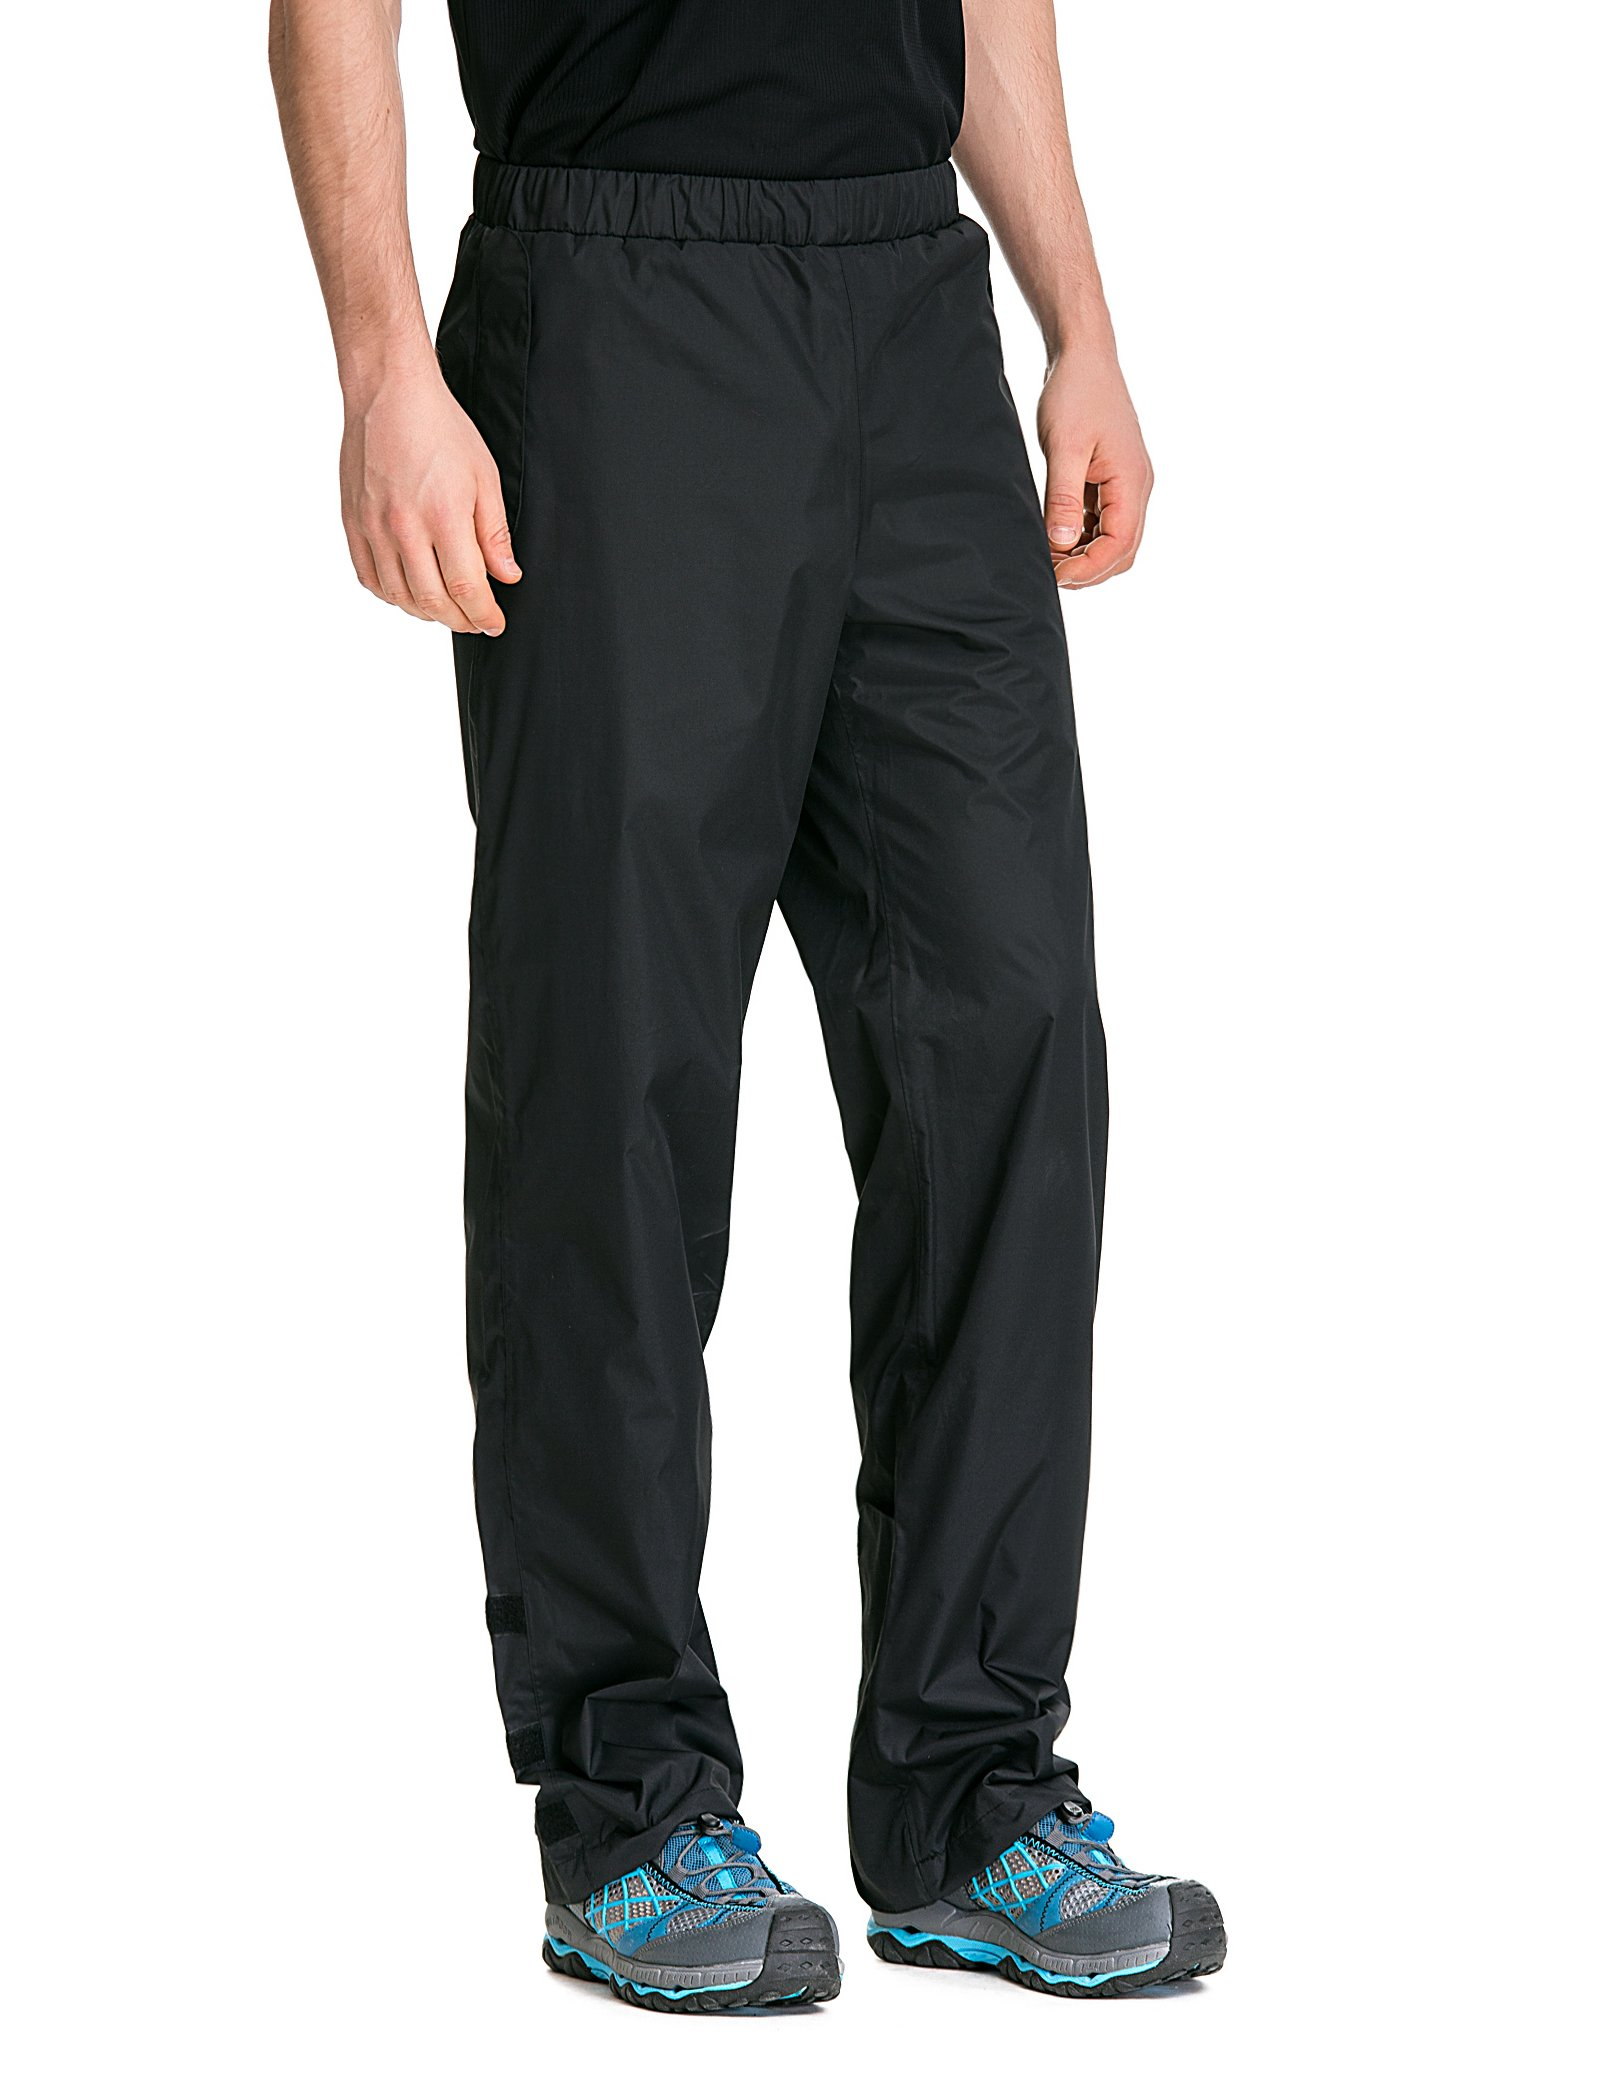 Trailside Supply Co. Men's Waterproof Windproof Elastic-Waist Rain Pants (Black,X-Large) by Trailside Supply Co. (Image #1)